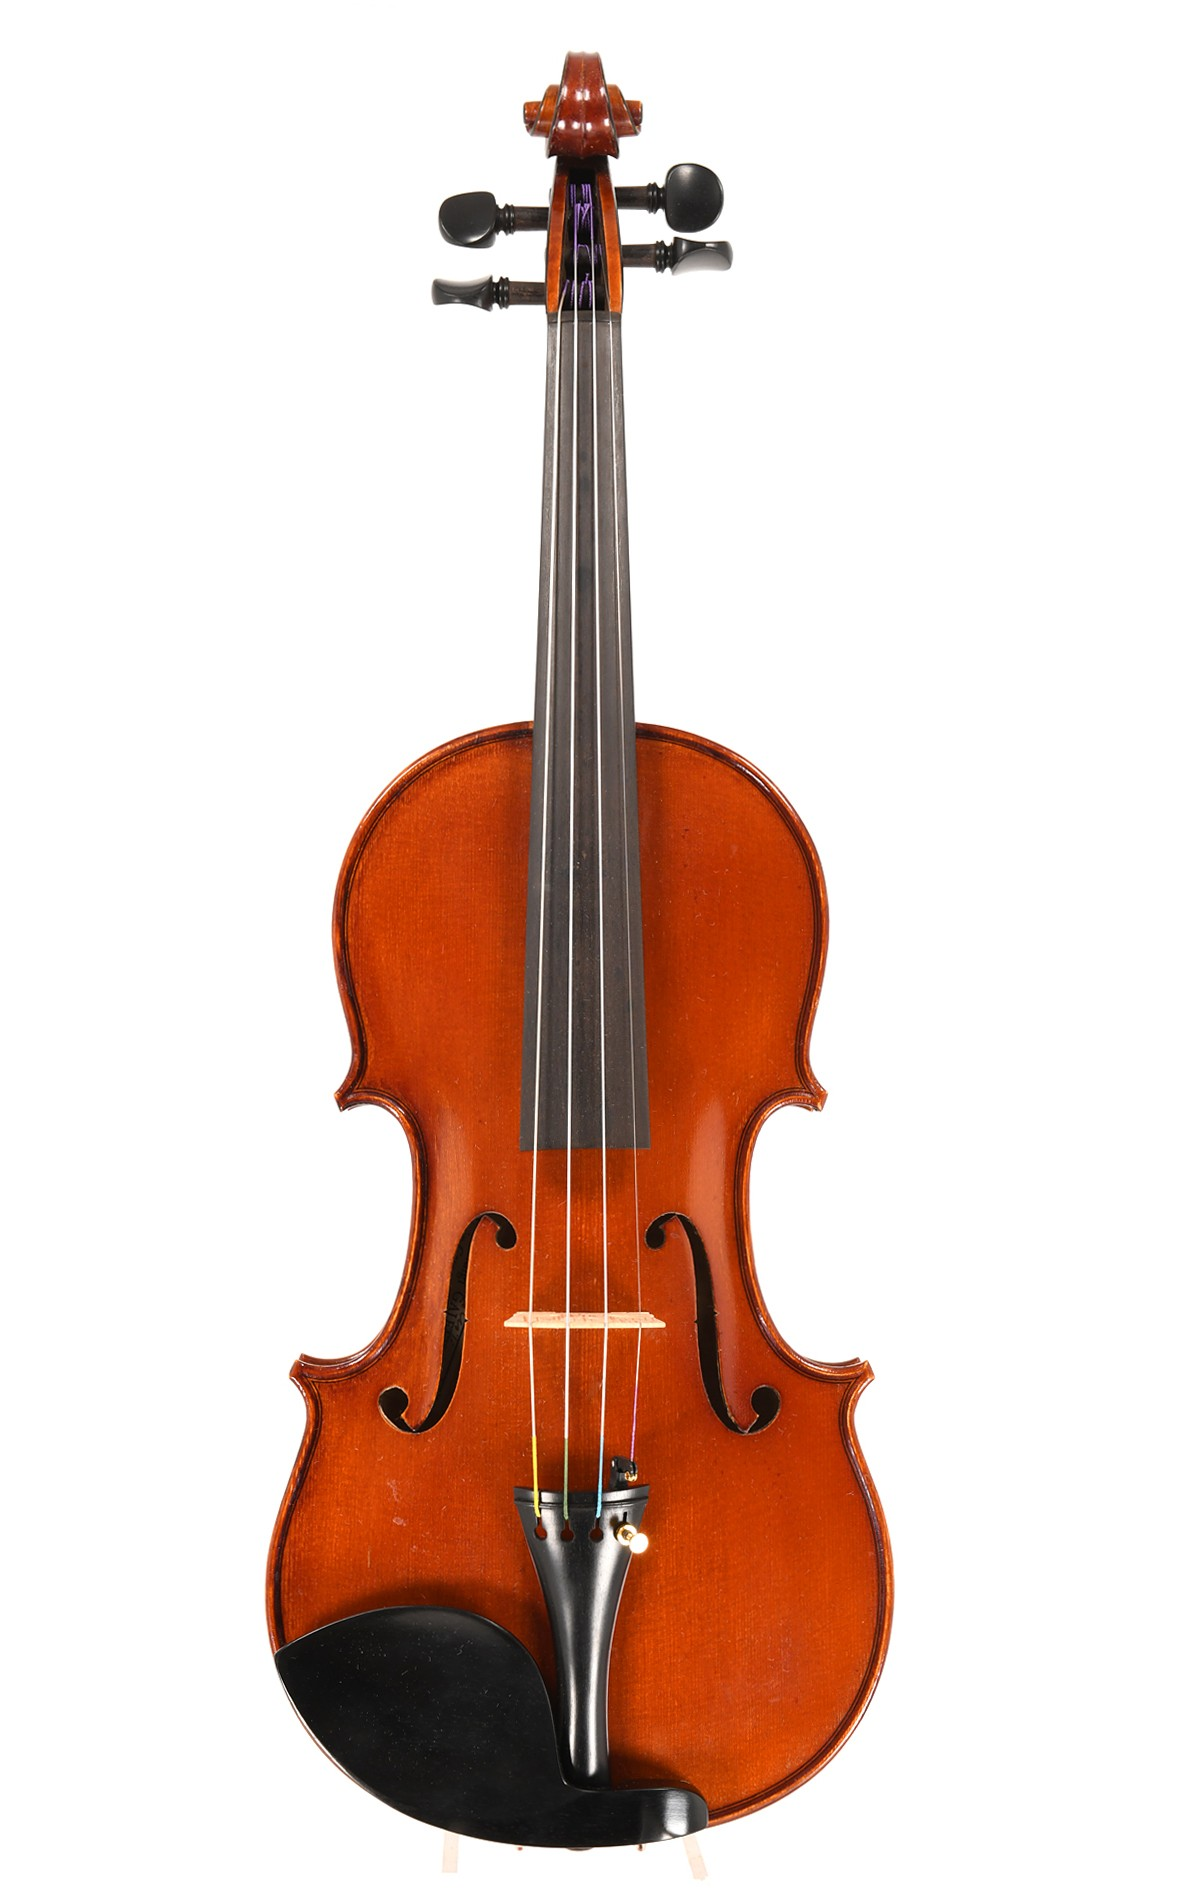 Italian violin - Pierluigi Galetti, Cremona 1999